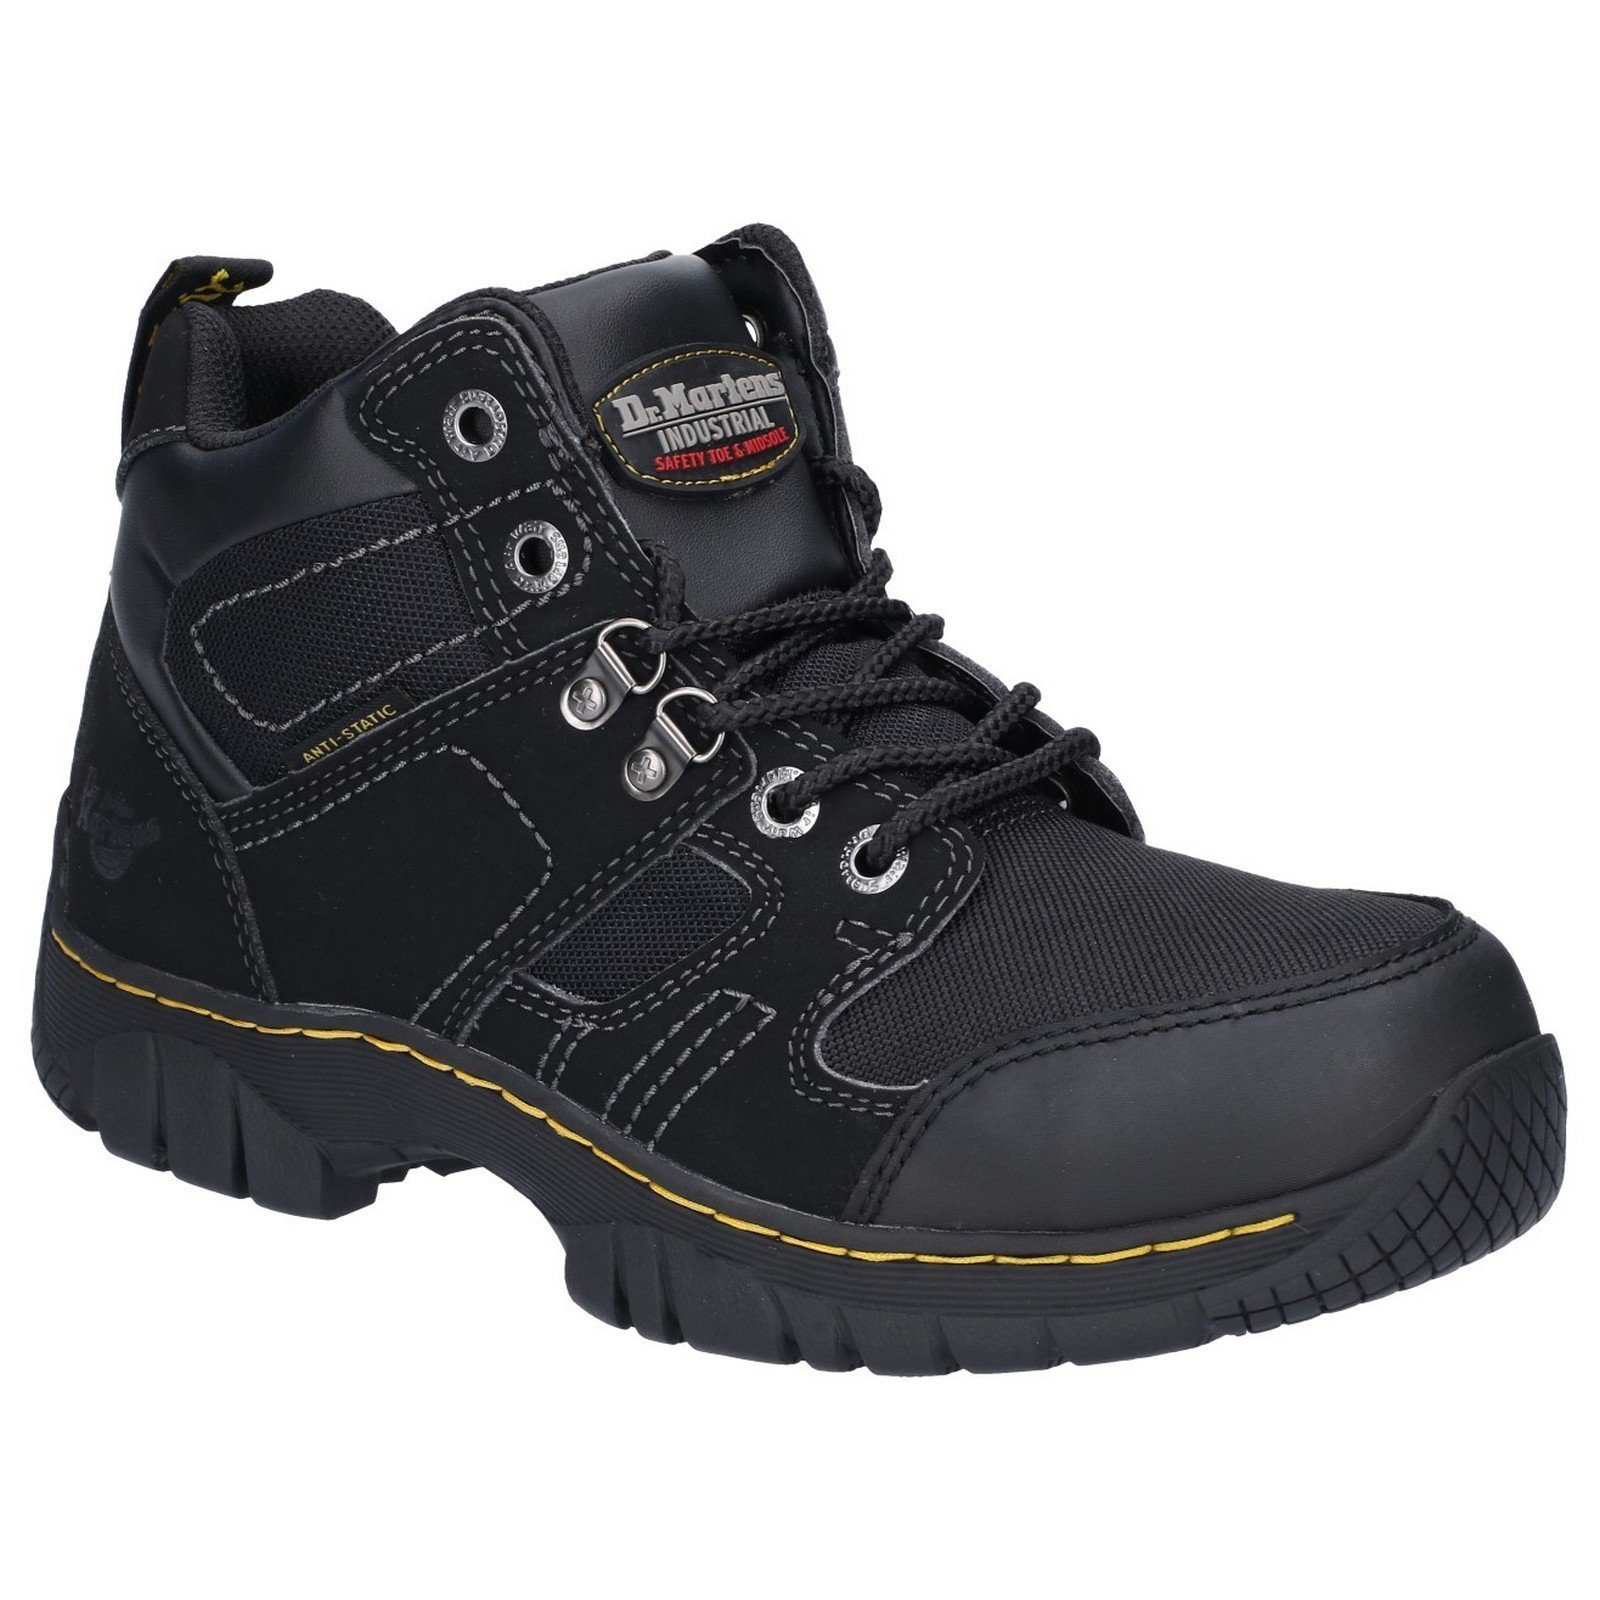 Dr Martens Unisex Benham Safety Boots Black 21647-34773 - Black 9